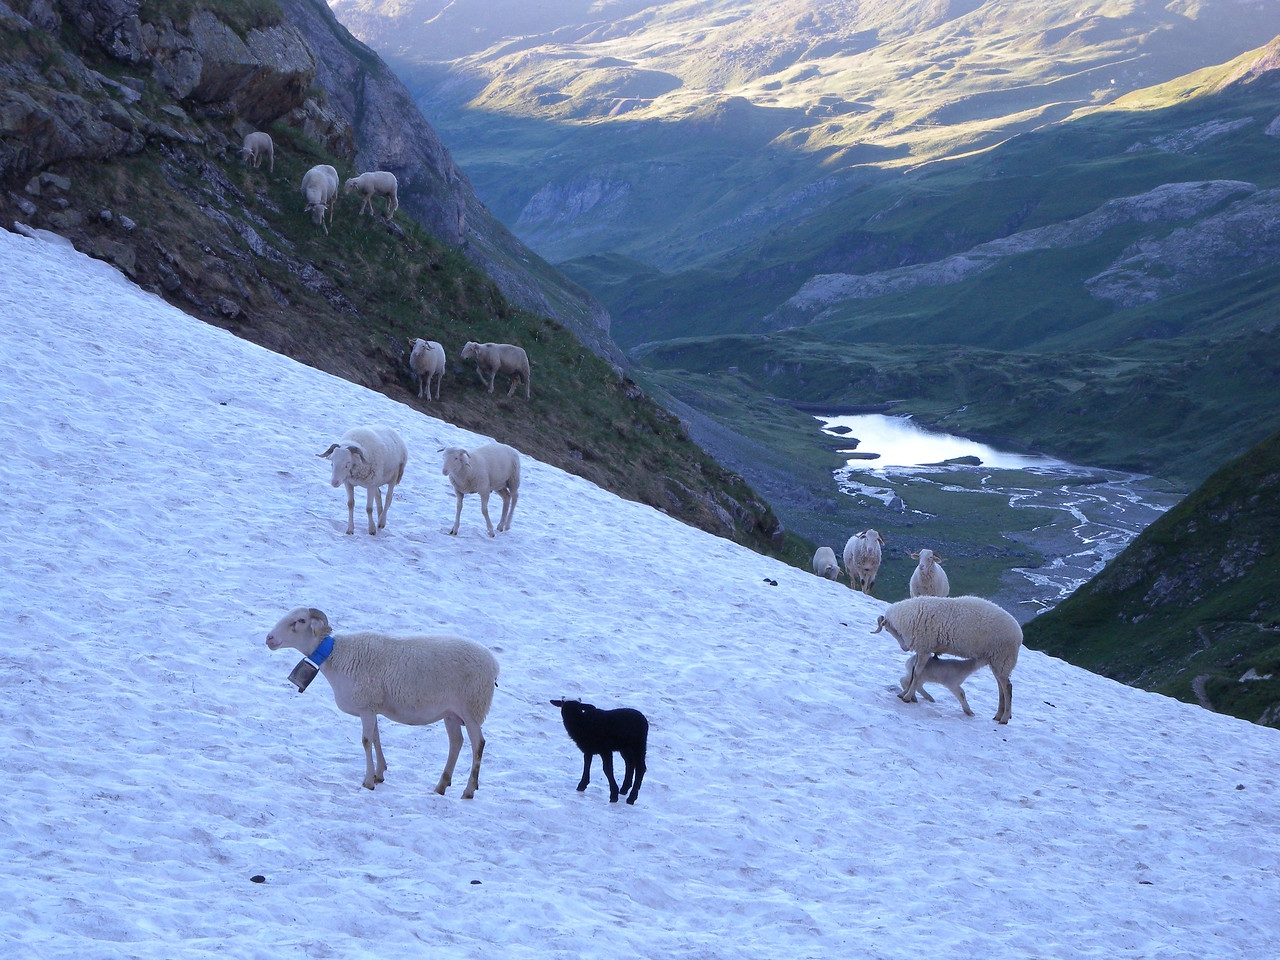 Sheep on snow 2